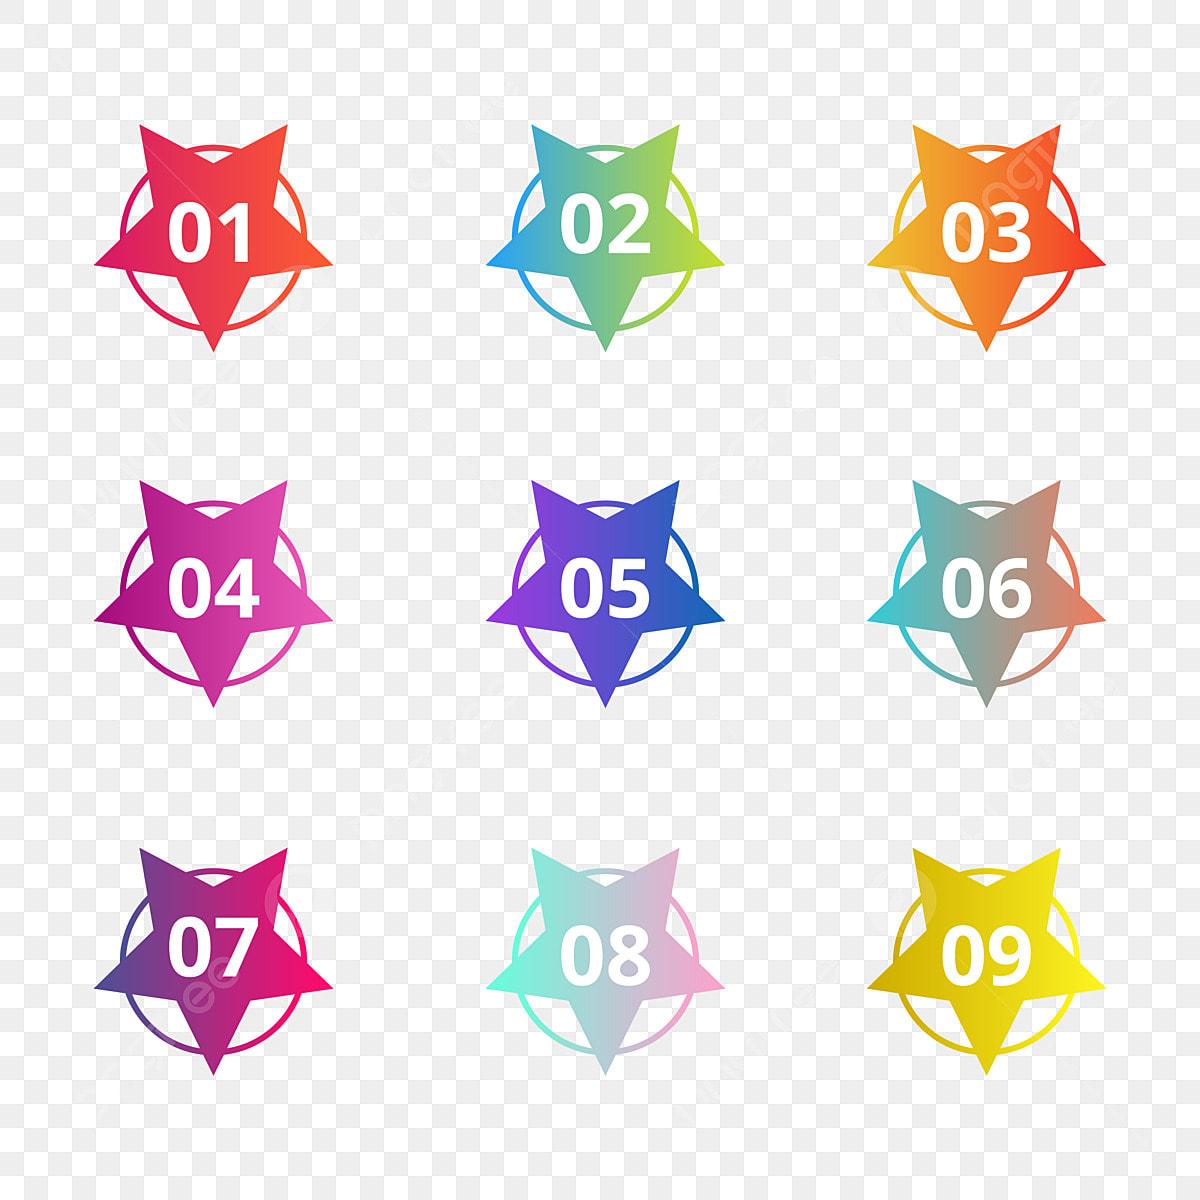 Number bullet points flat circles transparent — Stock Vector ©  leberus777.gmail.com #145519963